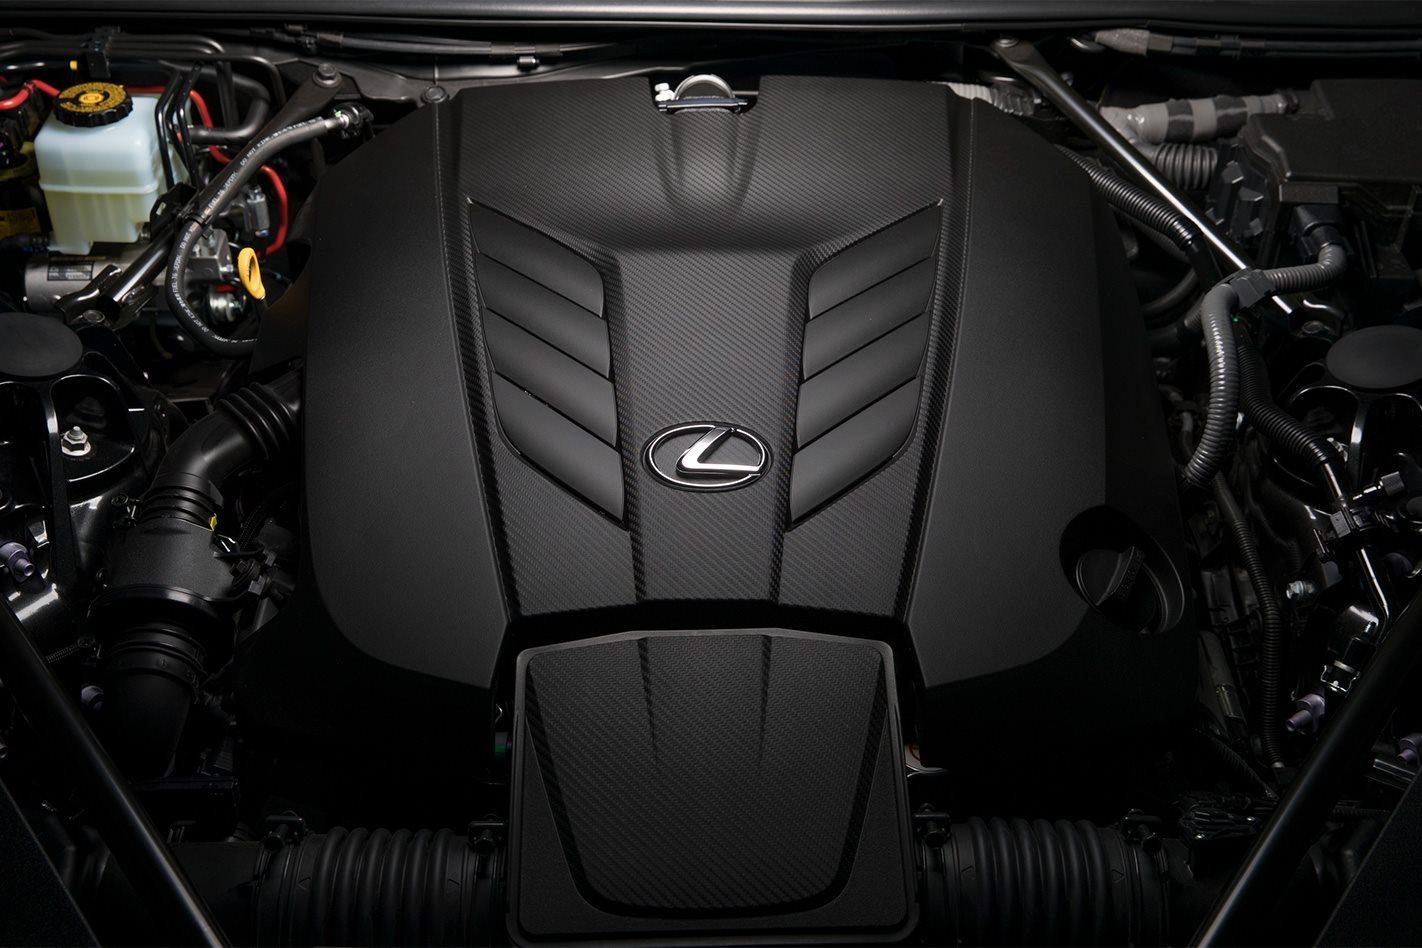 2018 Lexus LC 500 engine